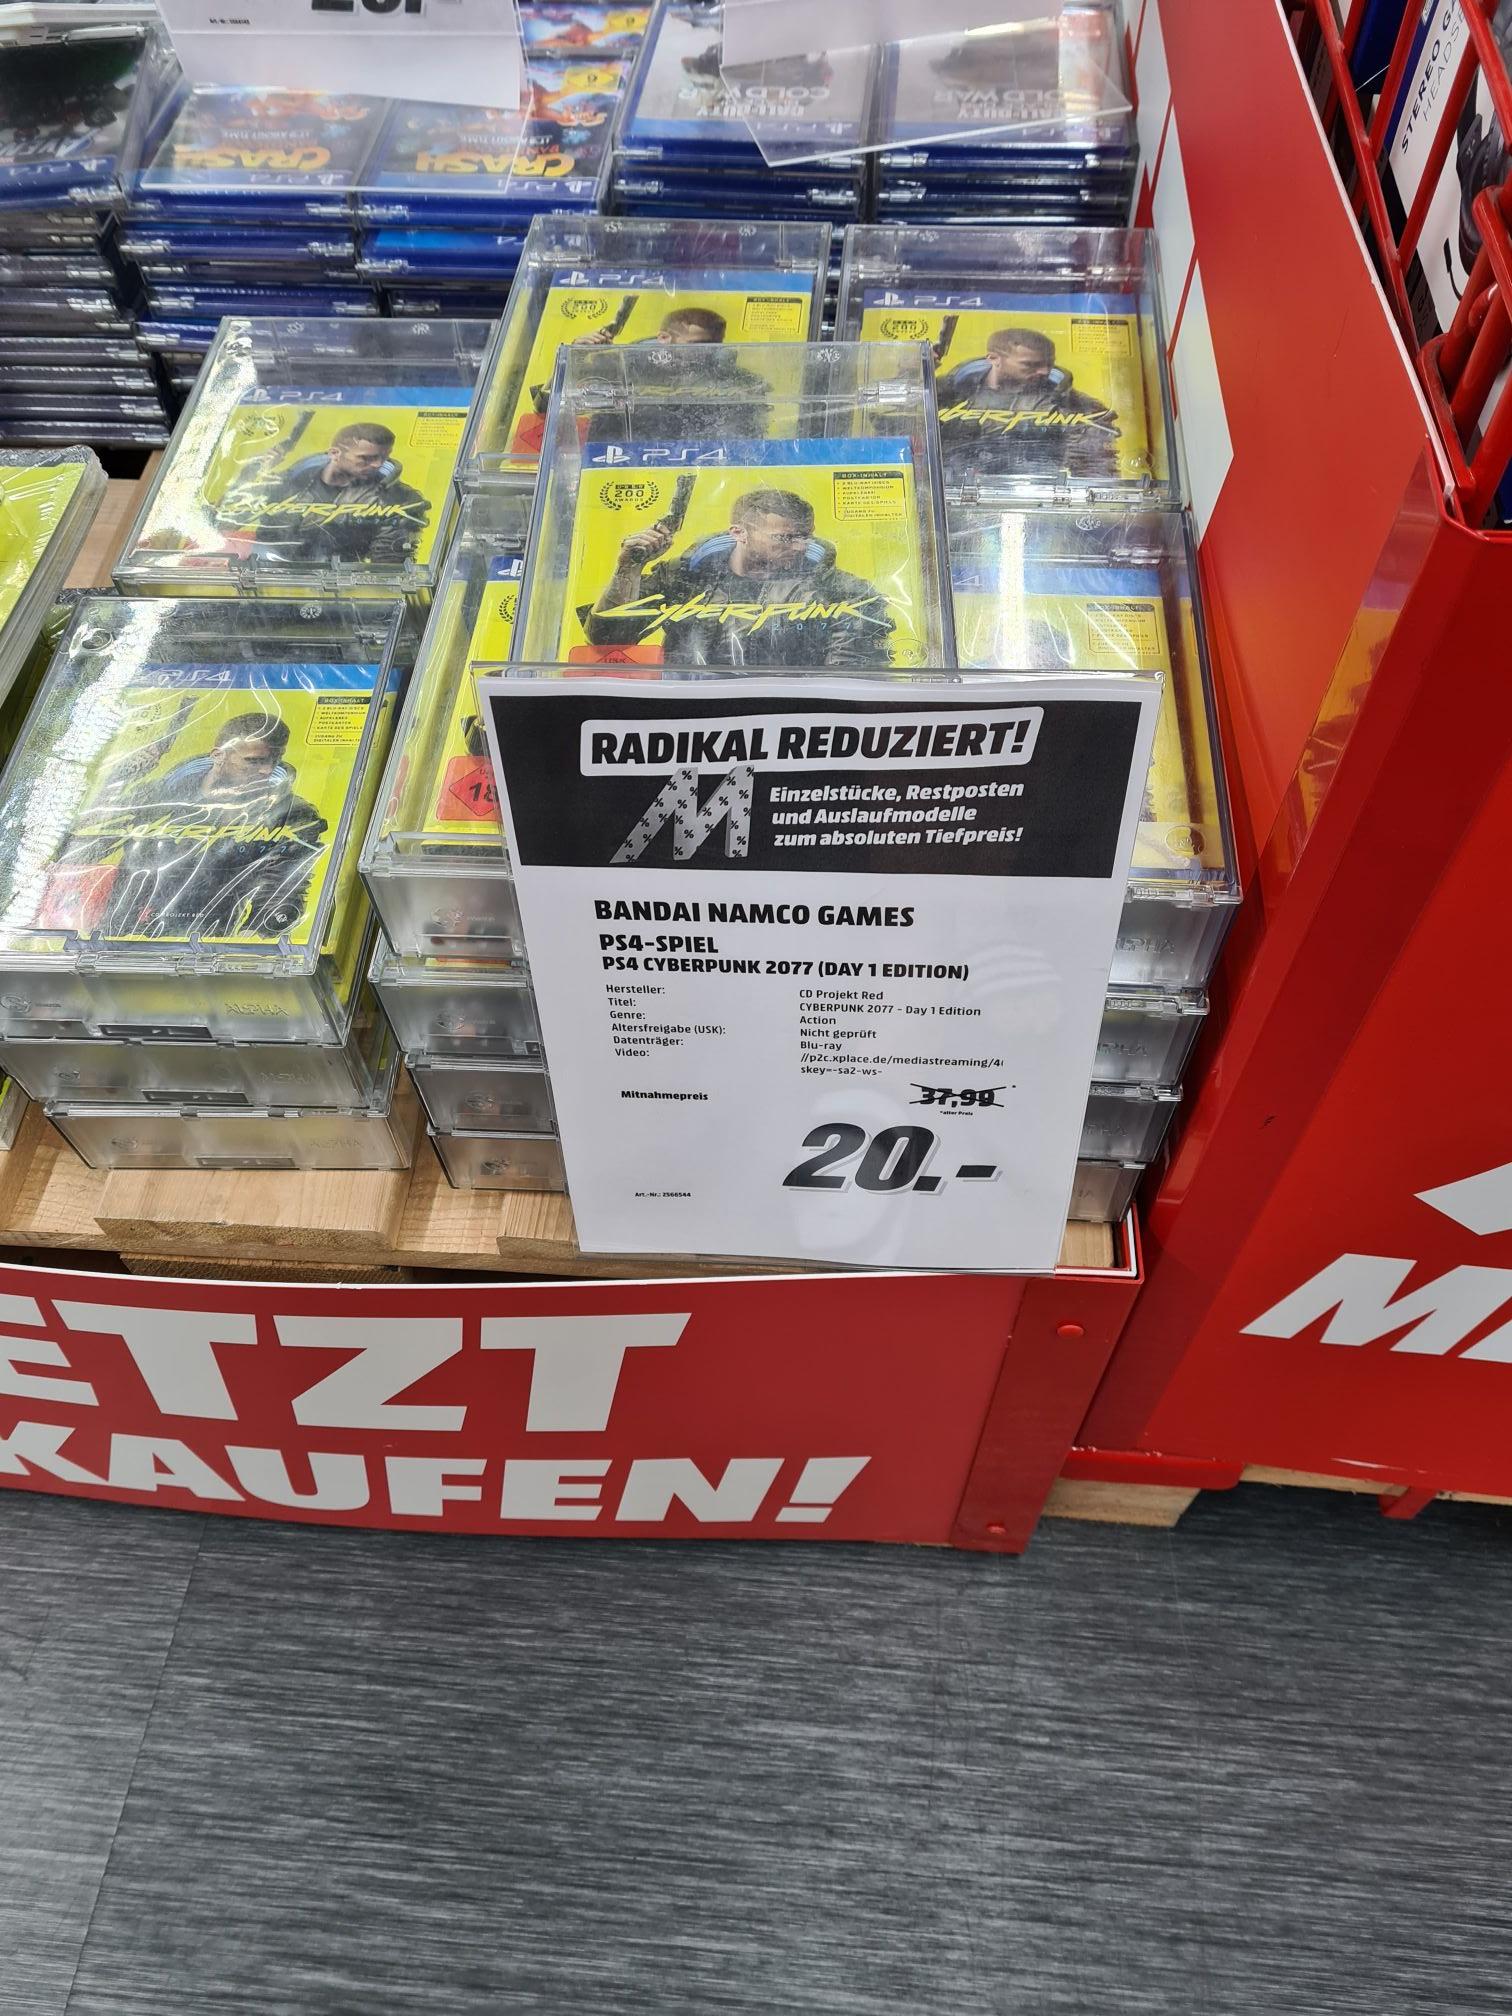 Cyberpunk 2077 PS4 Day 1 Edition Lokal Media Markt HH- Harburg